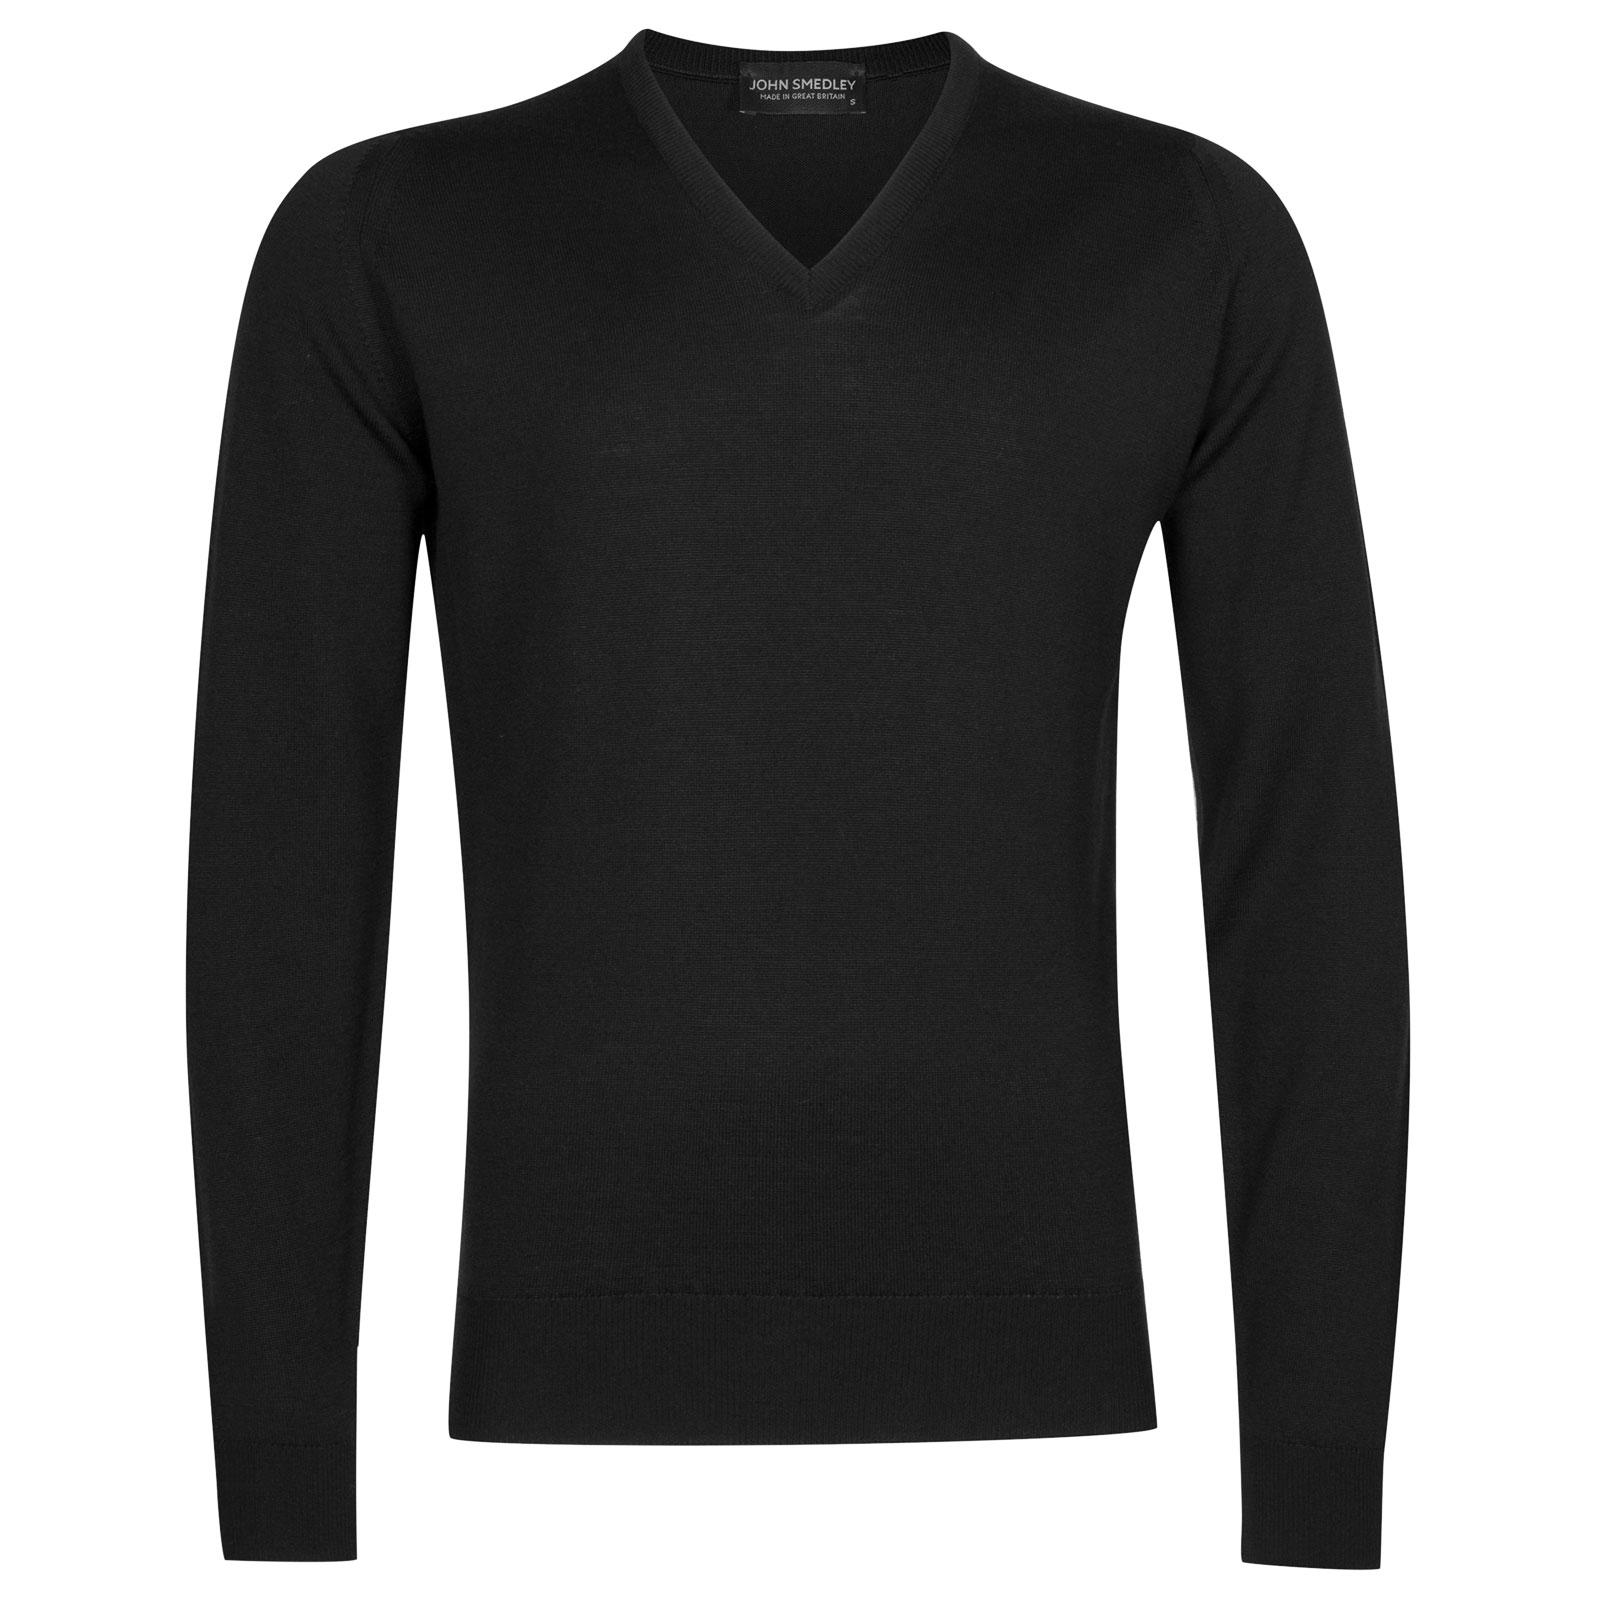 John Smedley Riber Merino Wool Pullover in Black-S